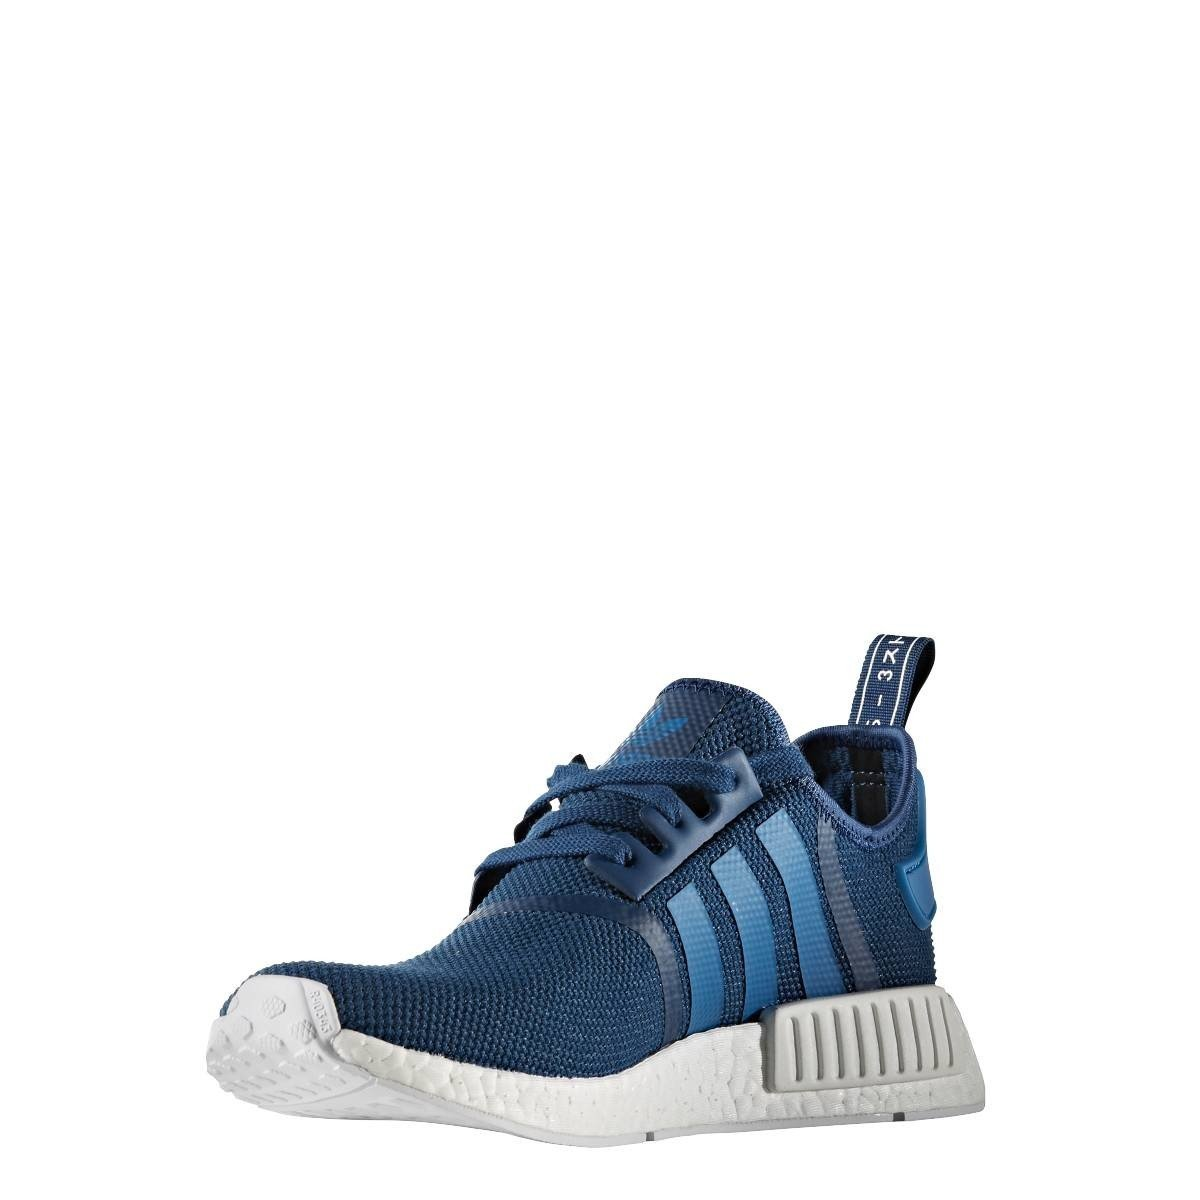 Unite Blau Nueva Adidas NMD R1